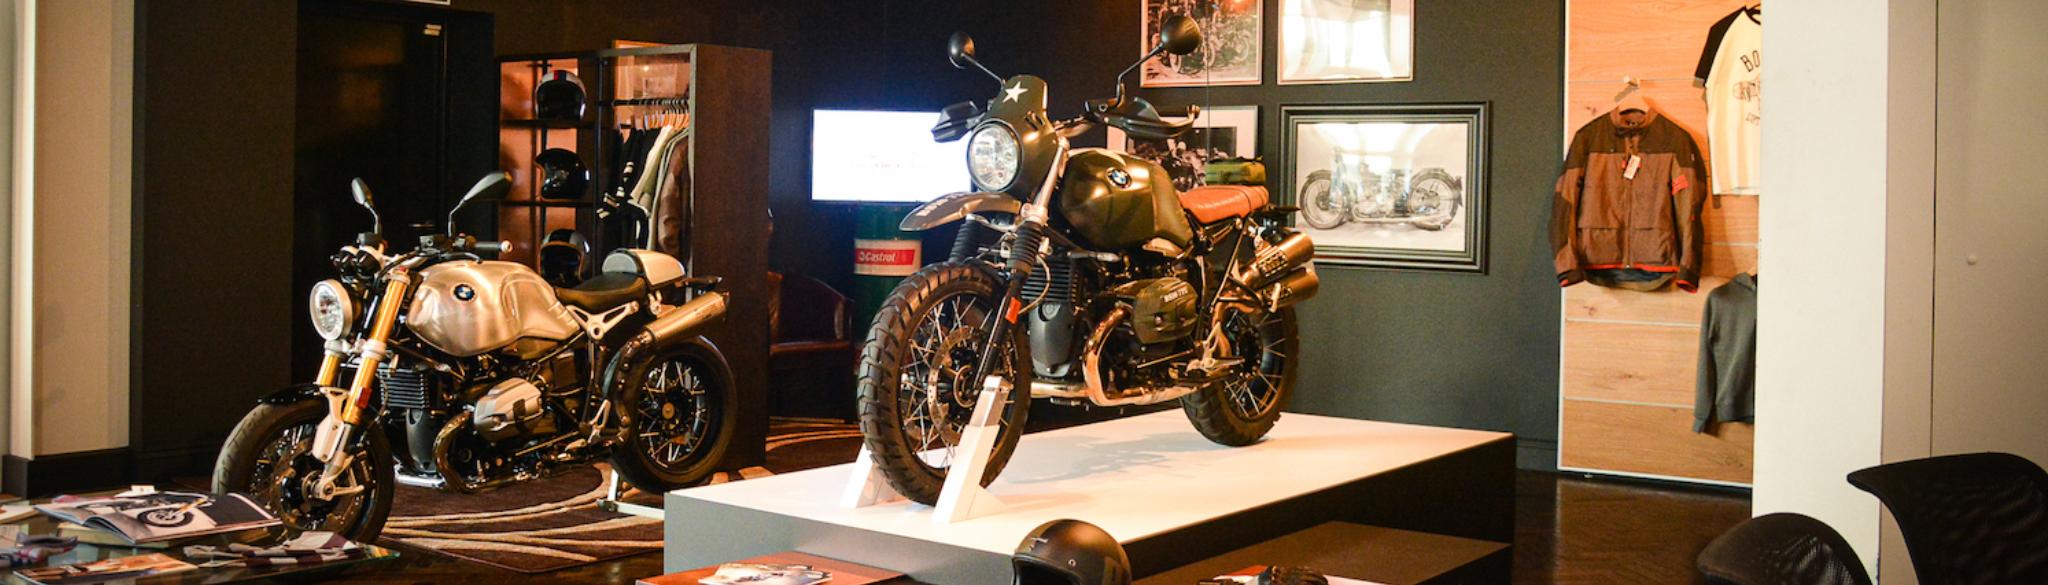 BMW Motorrad Bristol Heritage Range